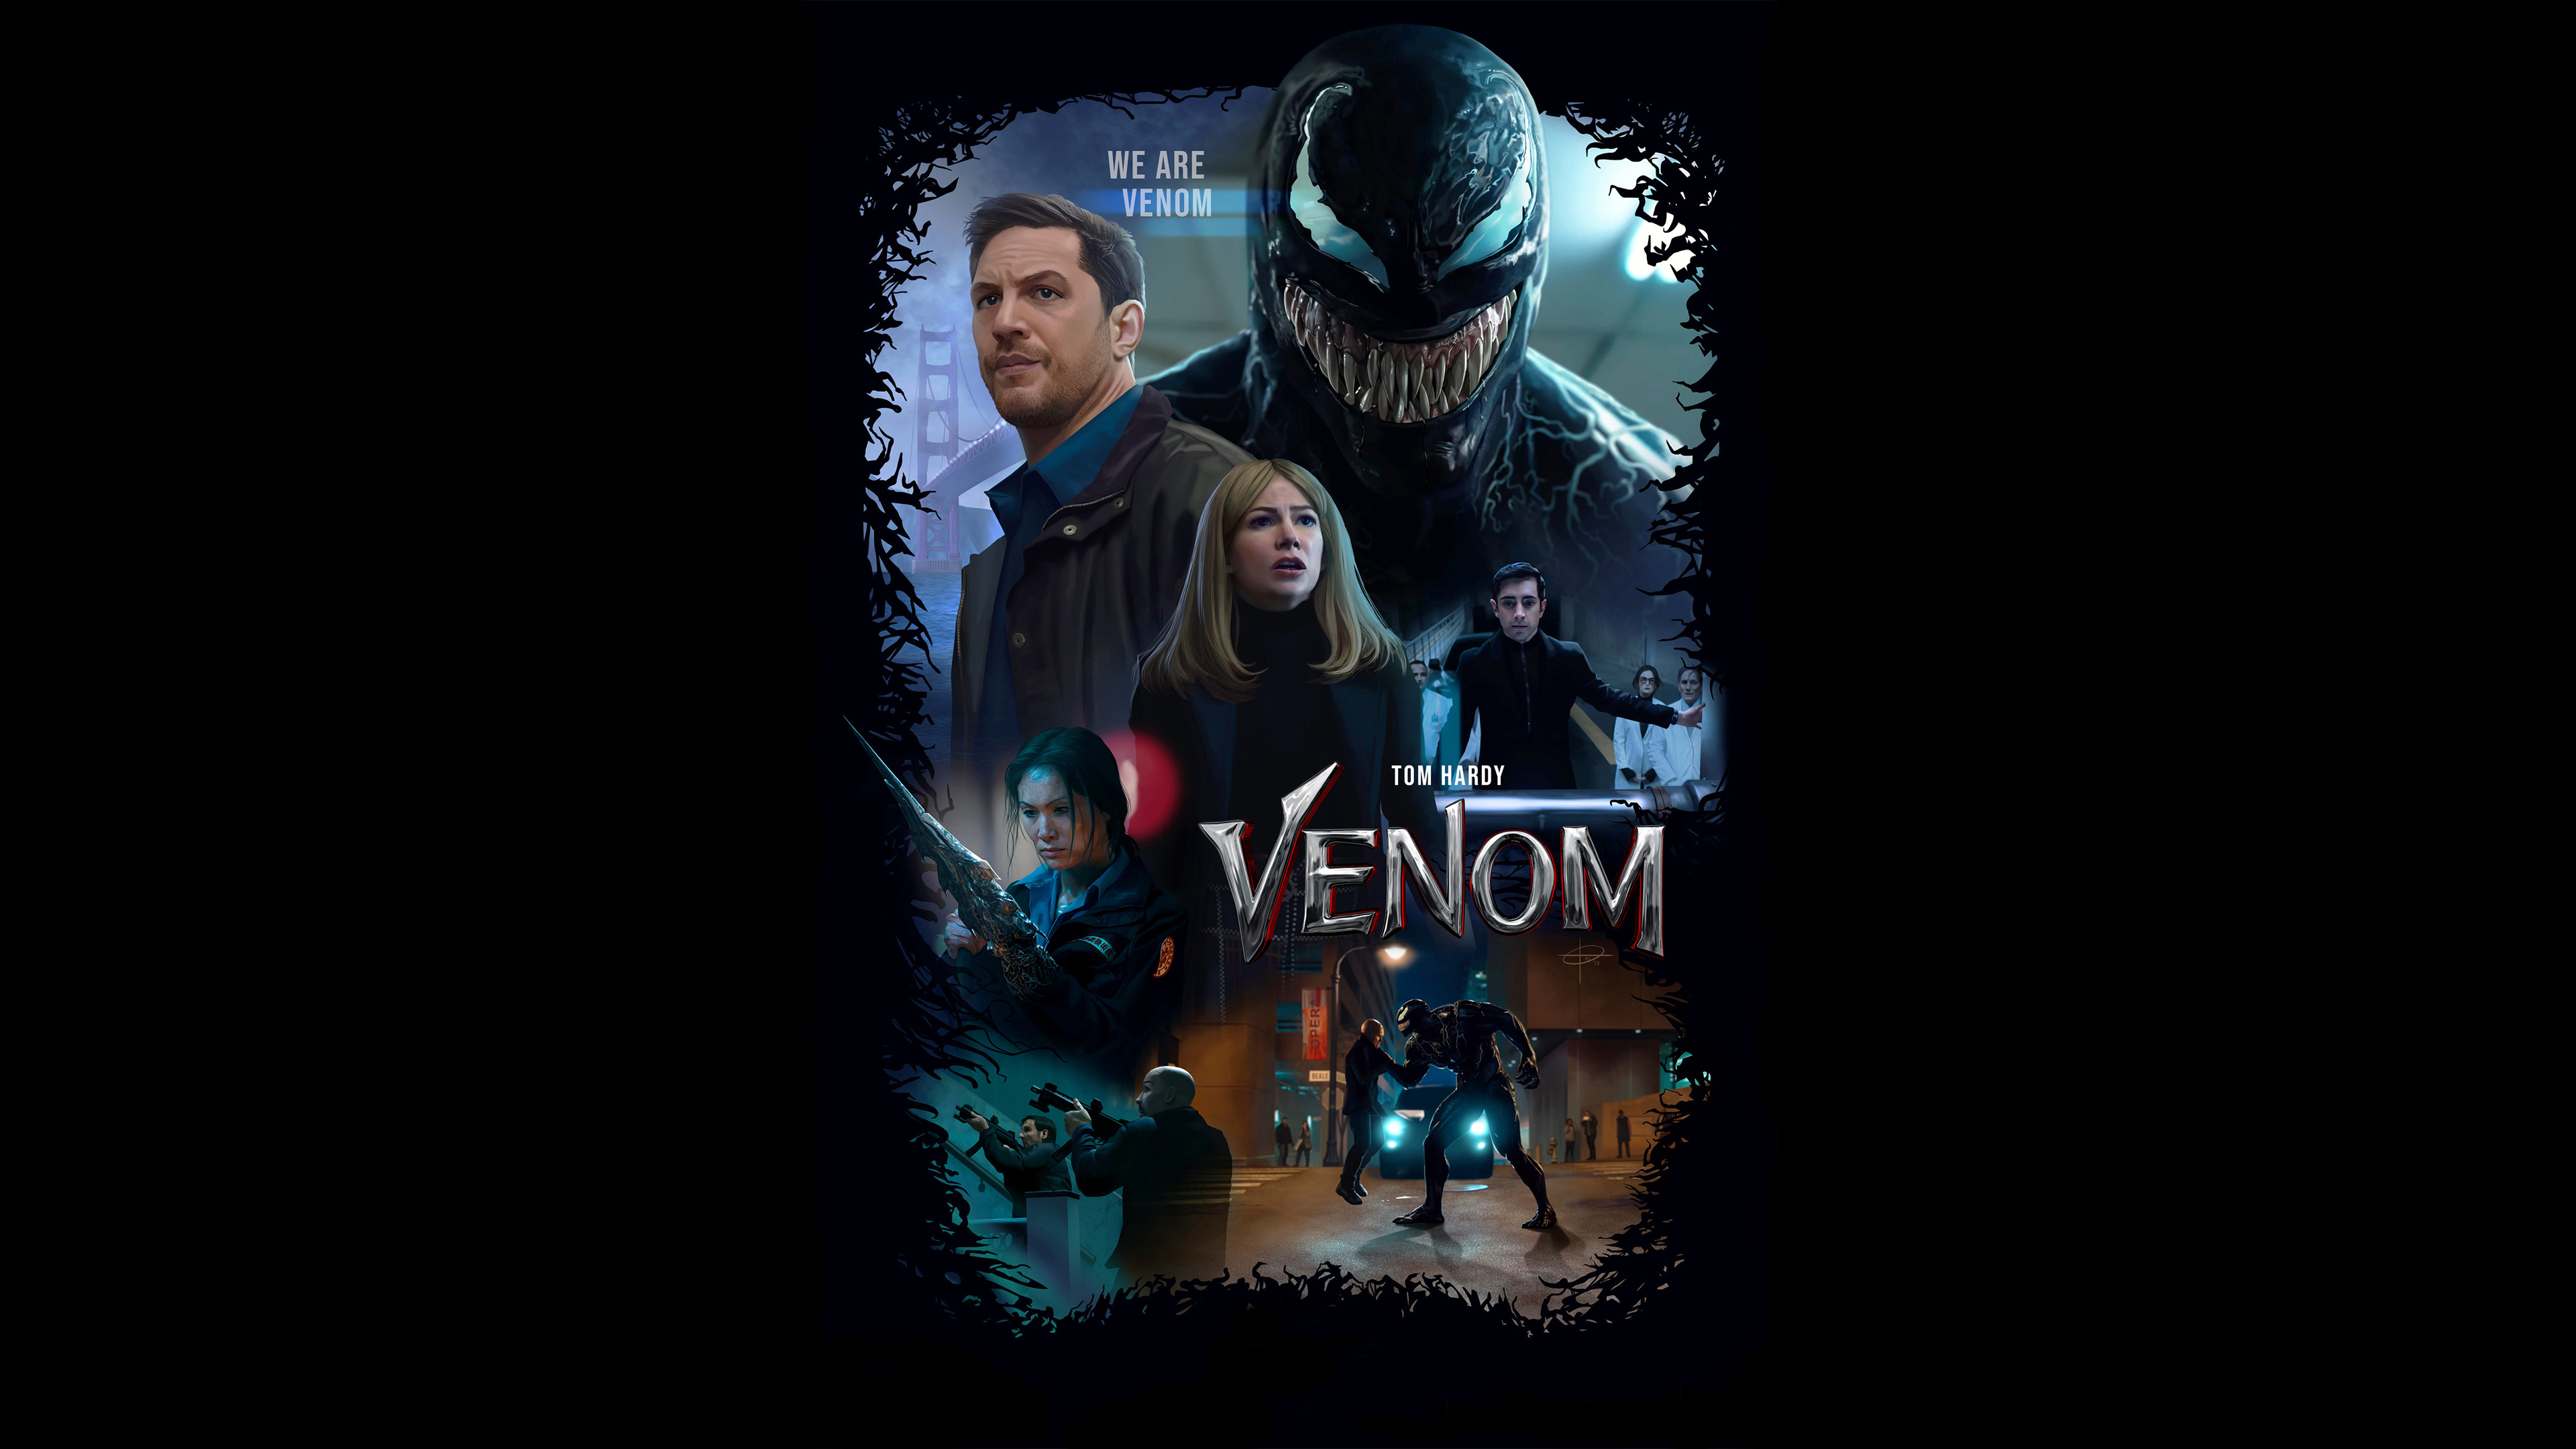 2048x2048 Venom 2018 Movie 4k Ipad Air Hd 4k Wallpapers: Venom The Movie 4k Venom Wallpapers, Venom Movie